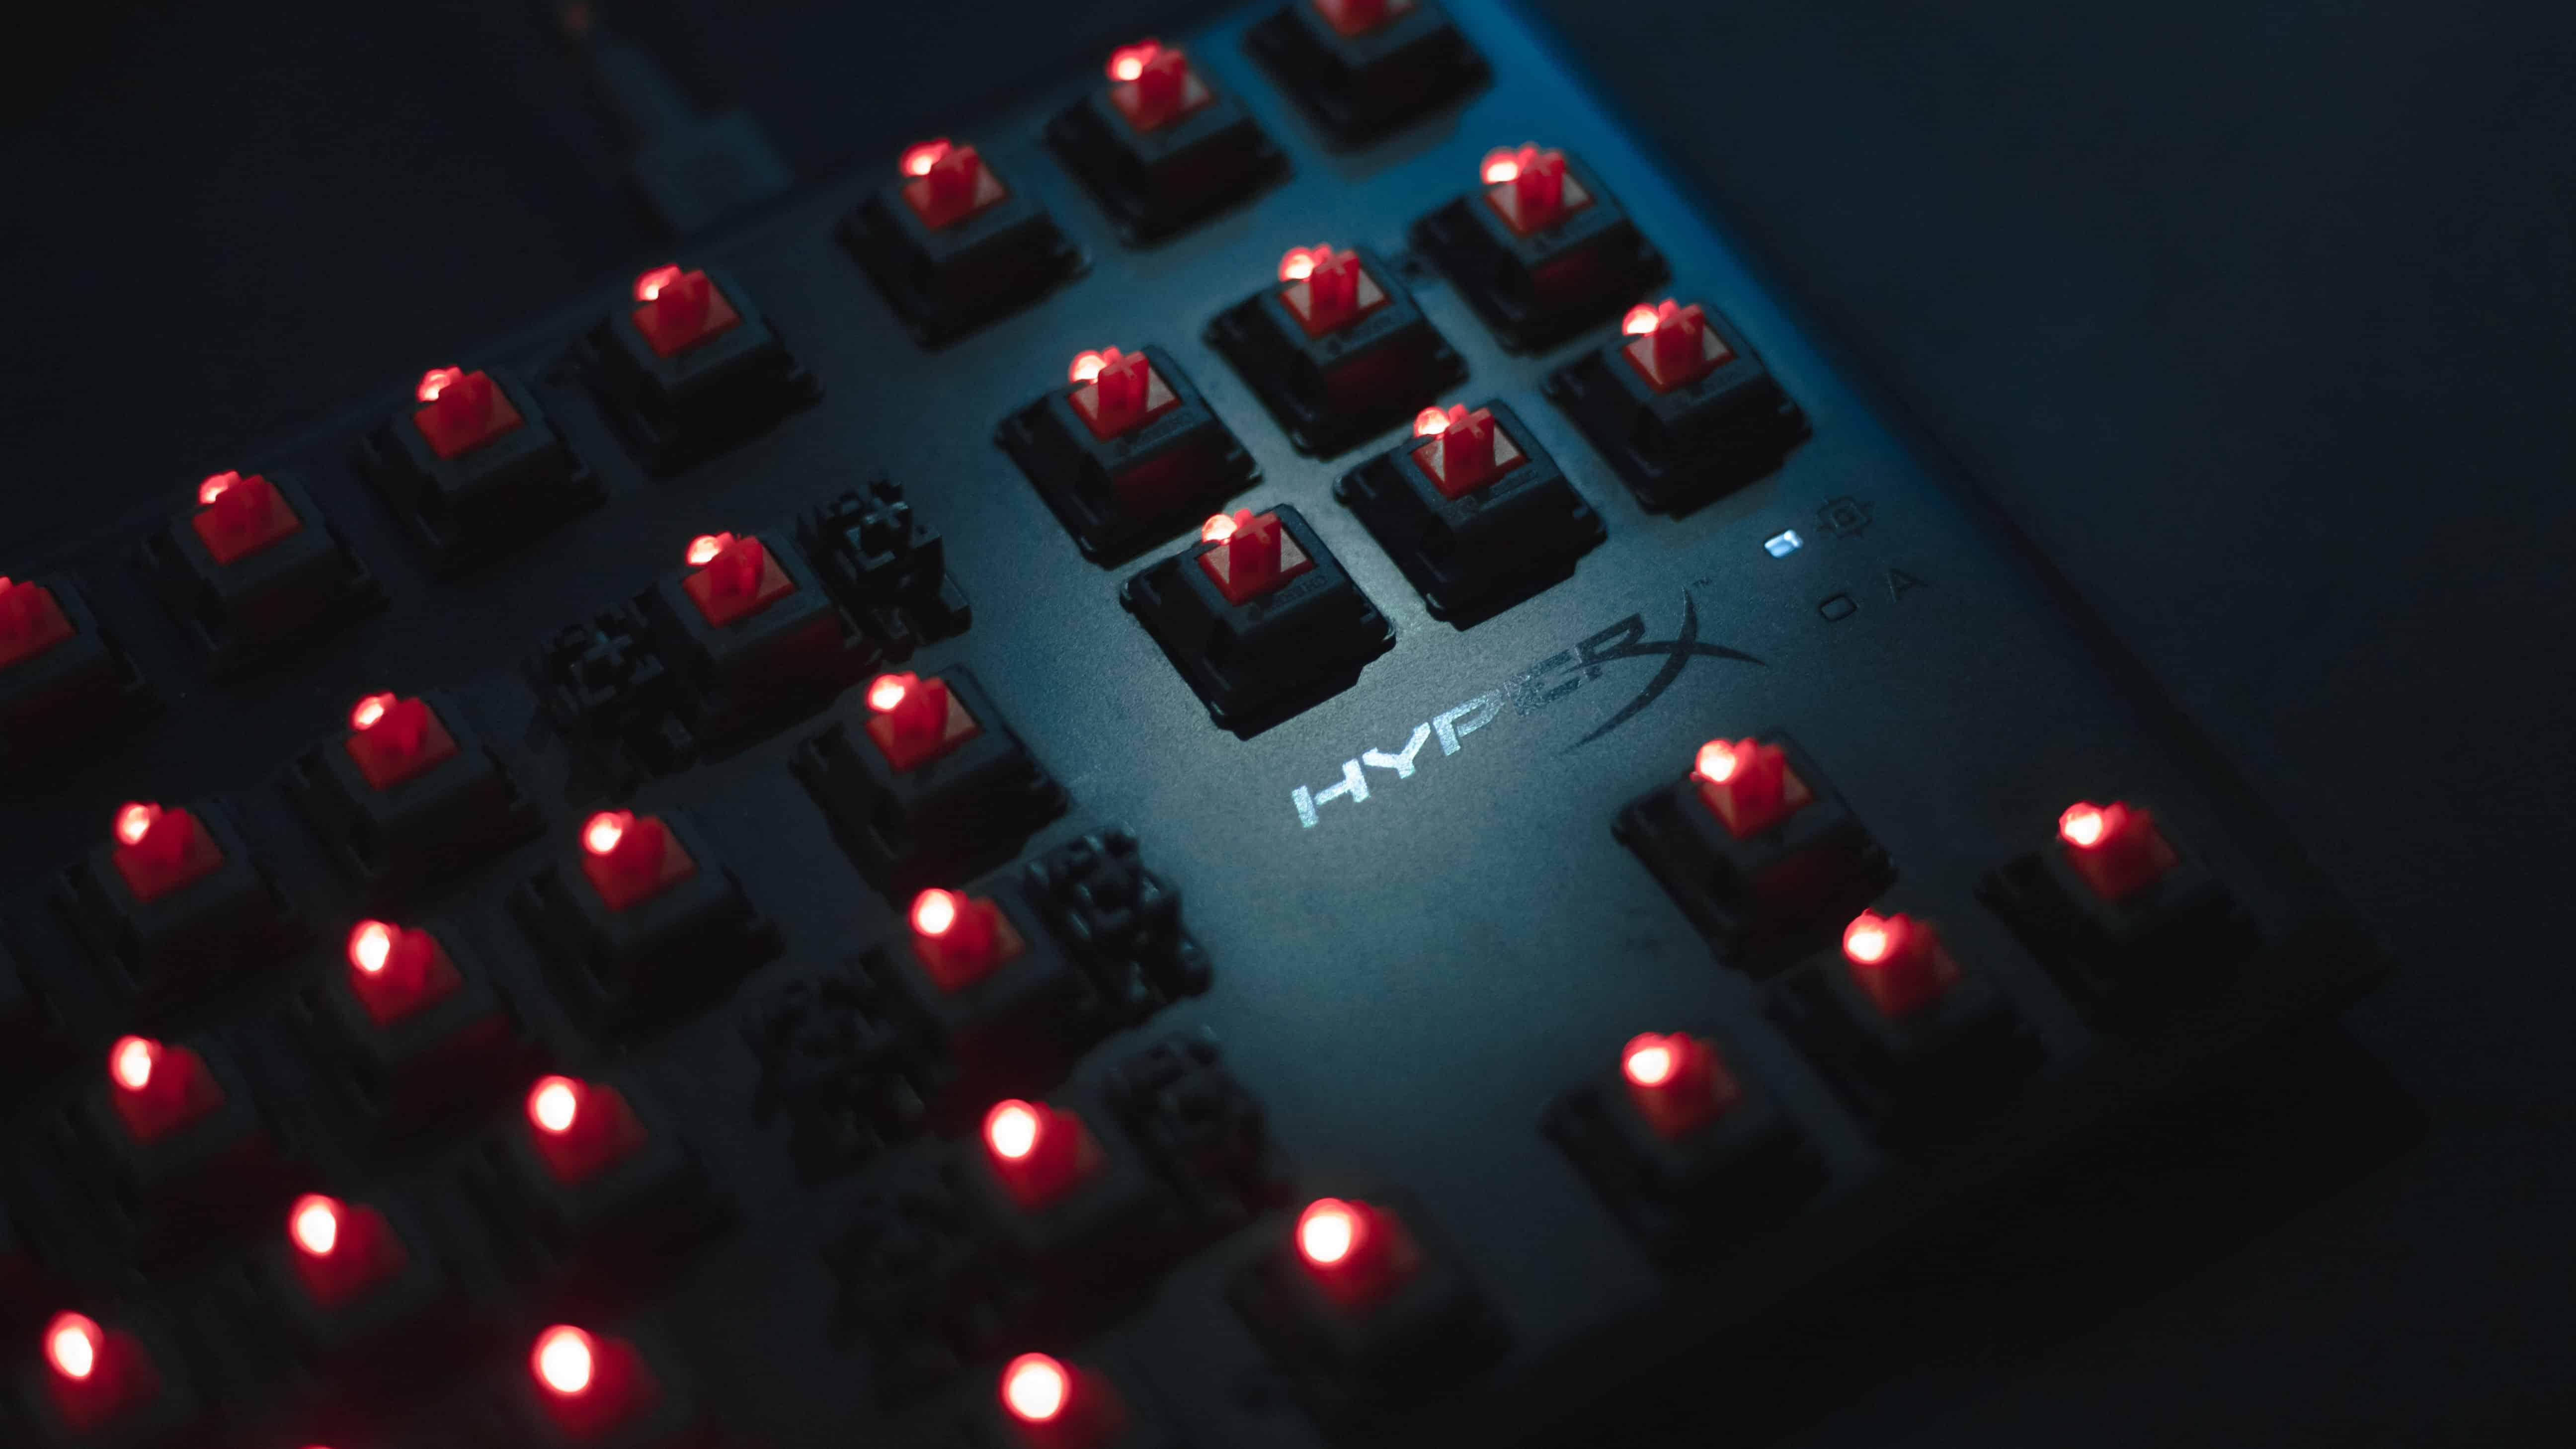 hyperx mechanical keyboard switches